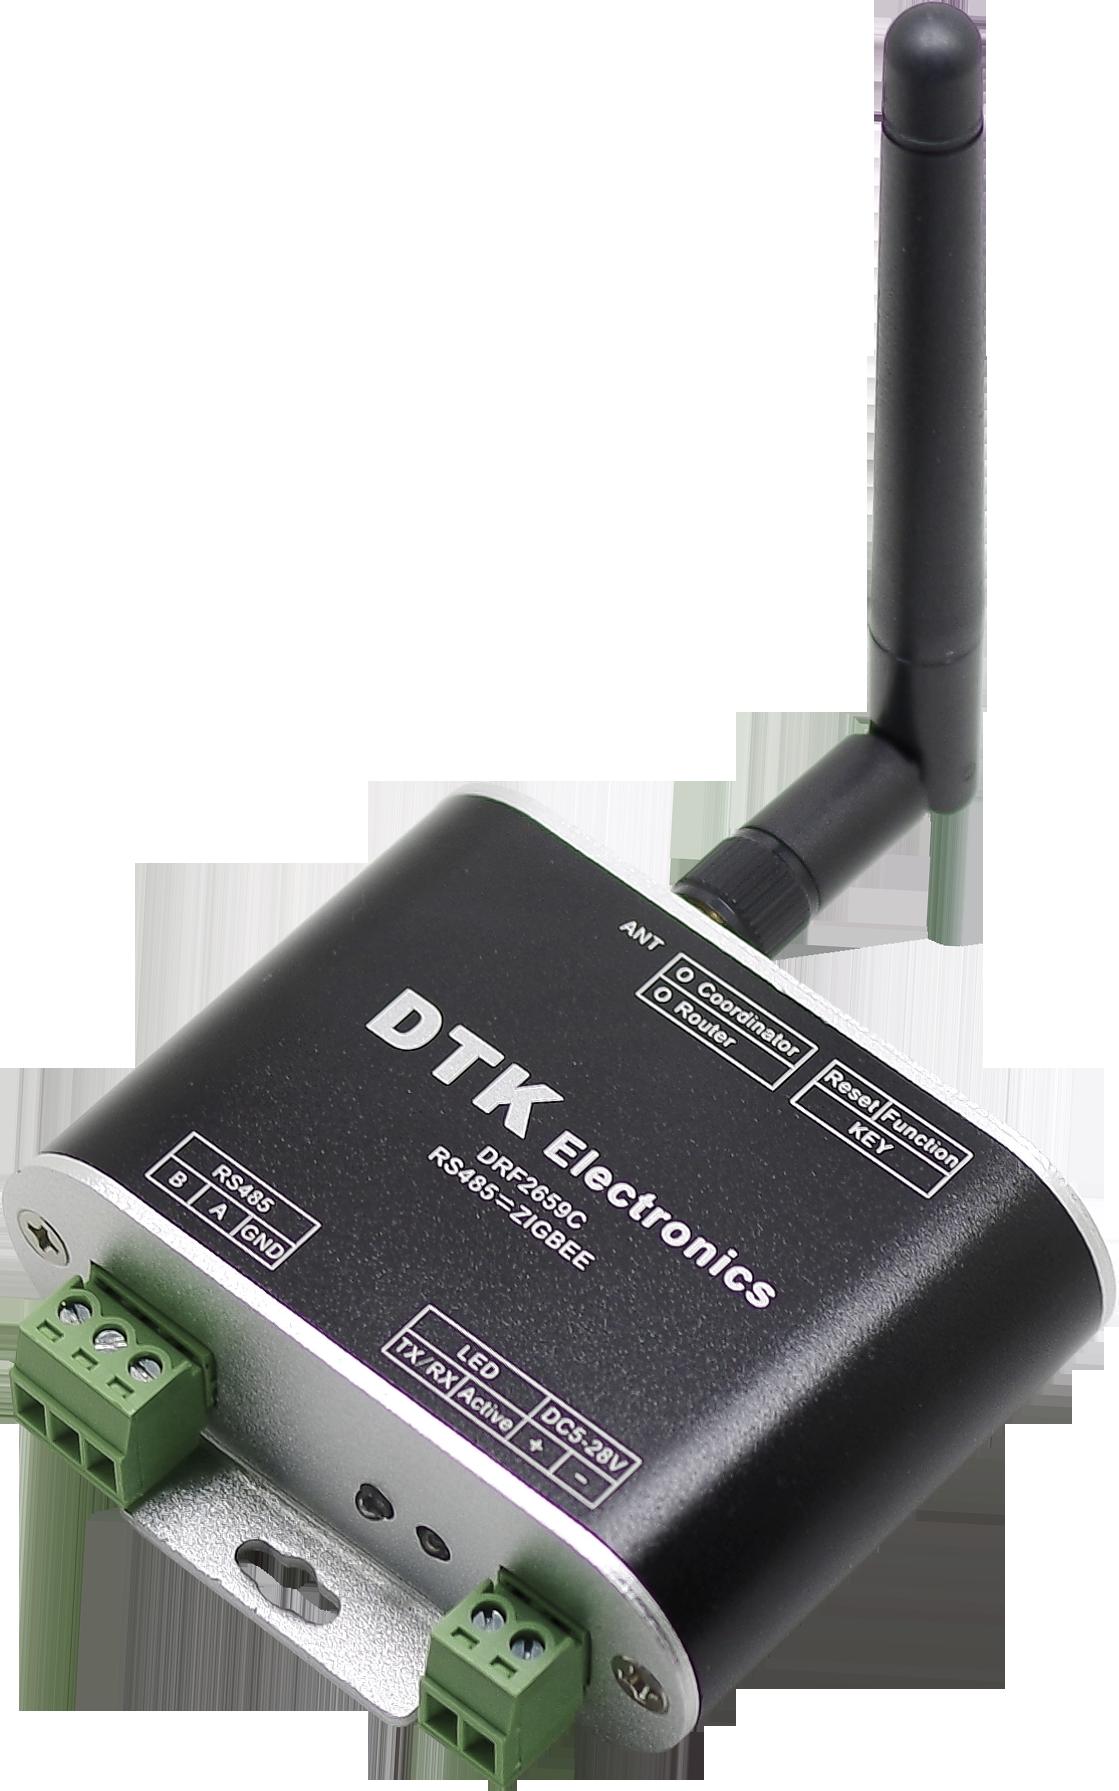 RS485  to ZigBee Wireless Module 1.6 Km Transmission CC2630 Chip<br>